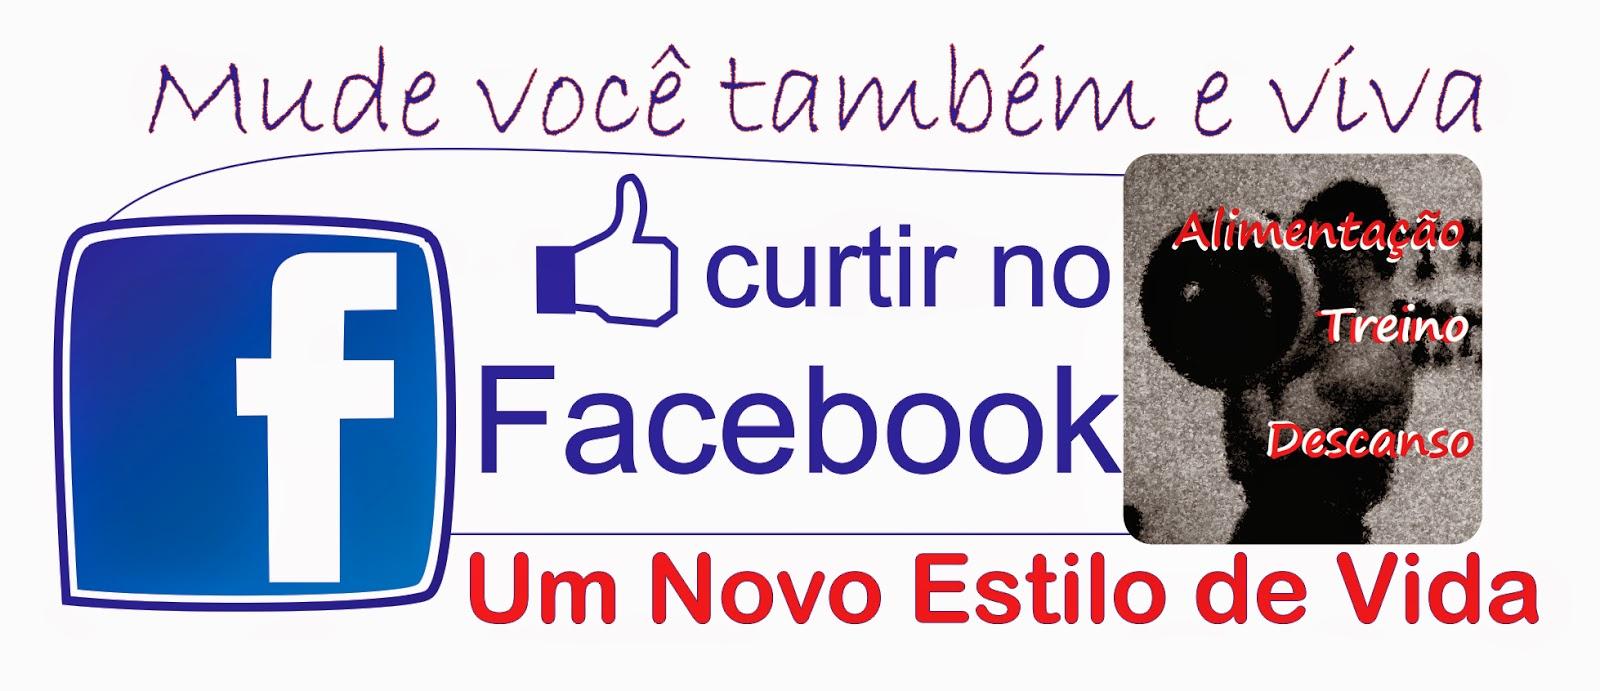 https://www.facebook.com/mudandoestilodevida?ref=hl&ref_type=bookmark